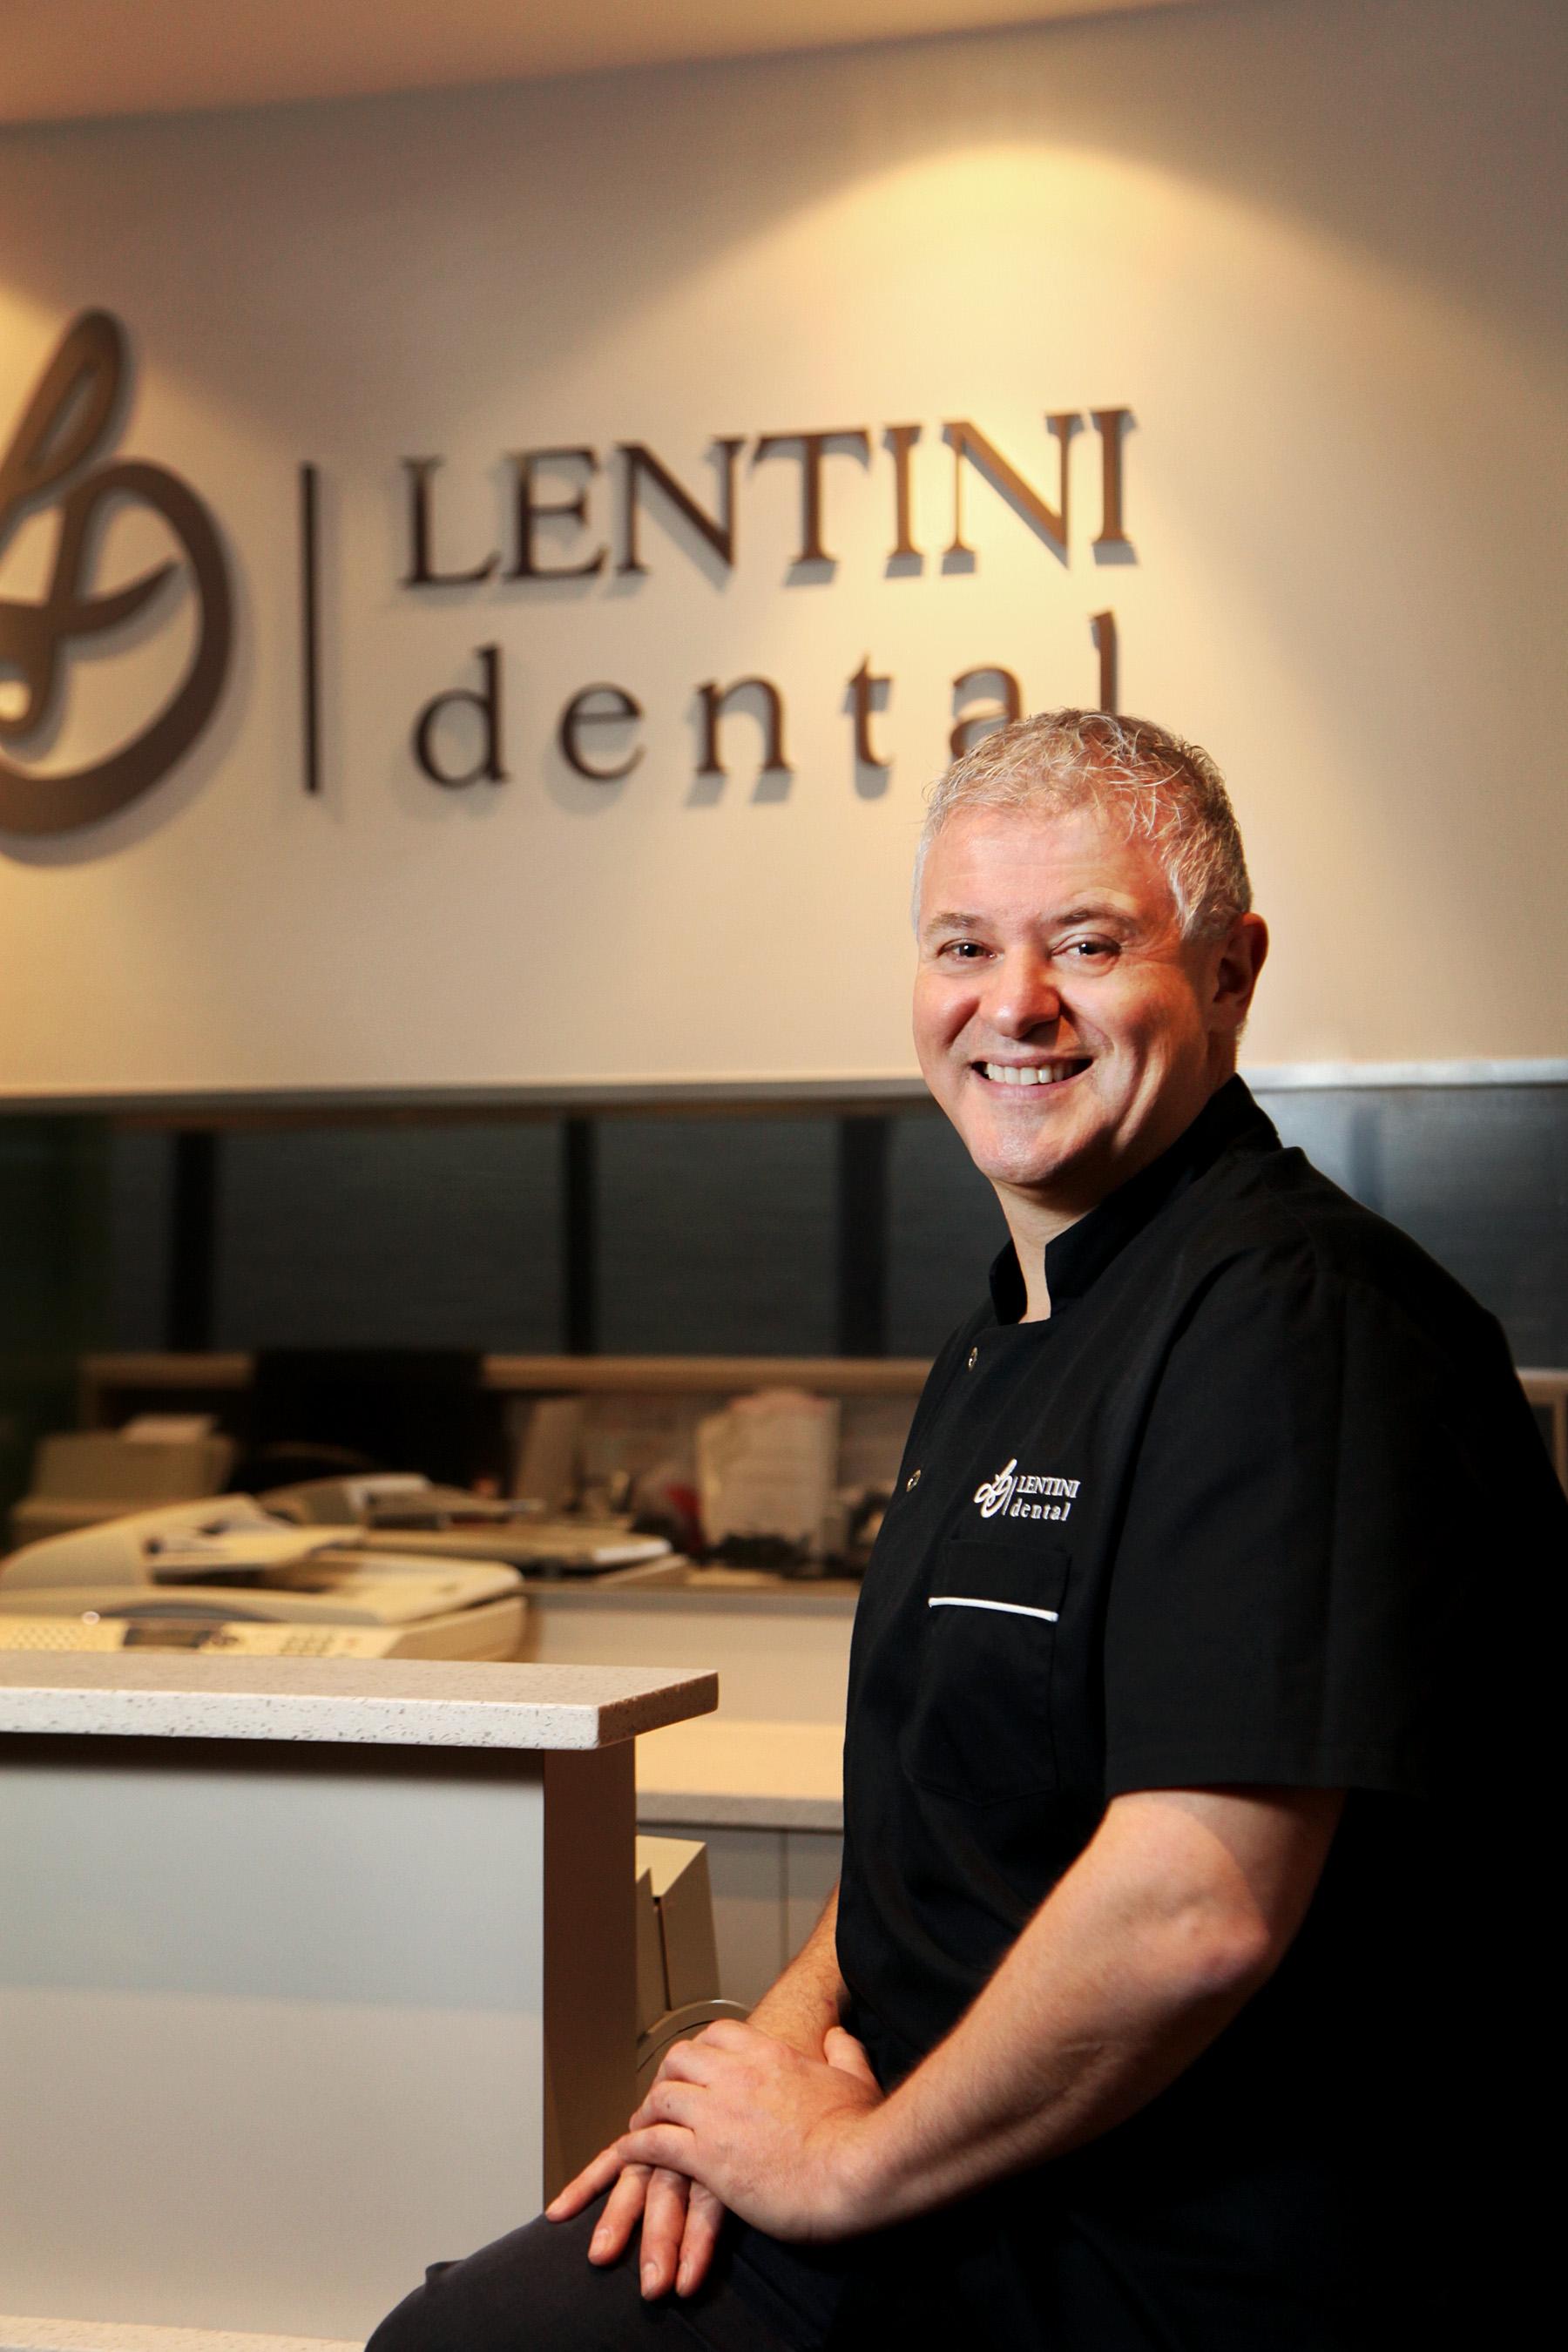 Lentini Dental